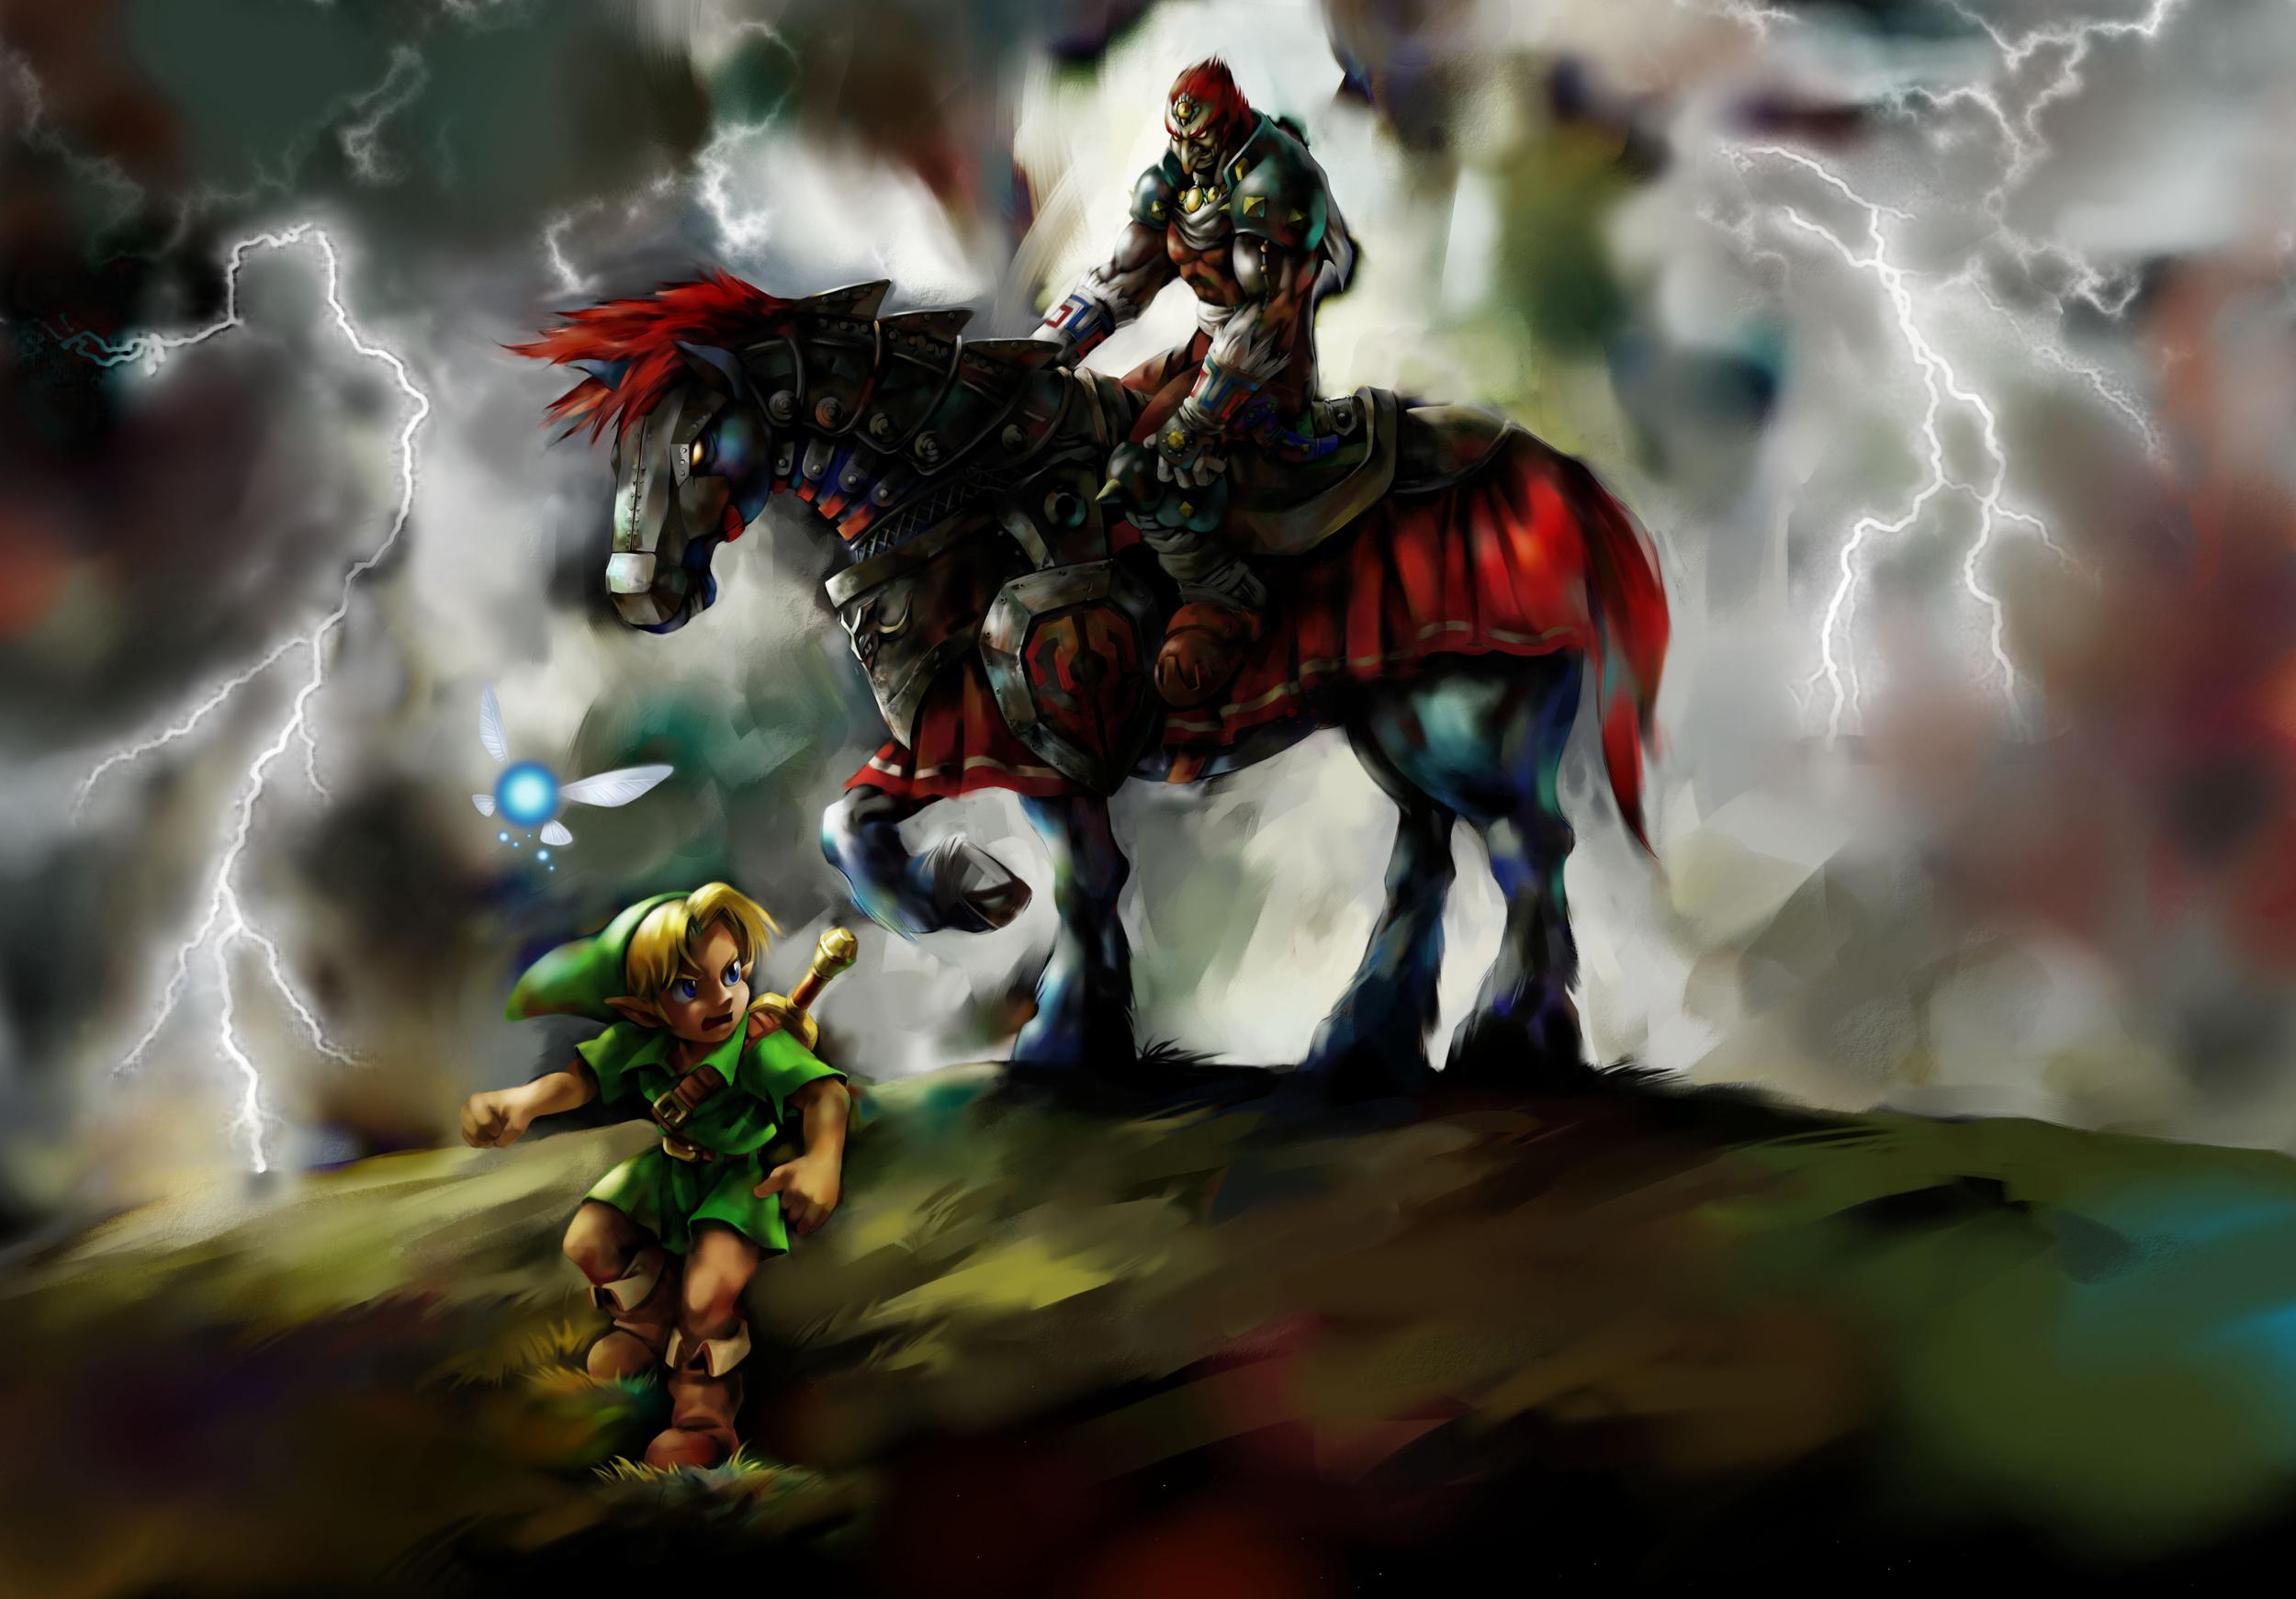 Ganondorf S Steed Zeldapedia Fandom